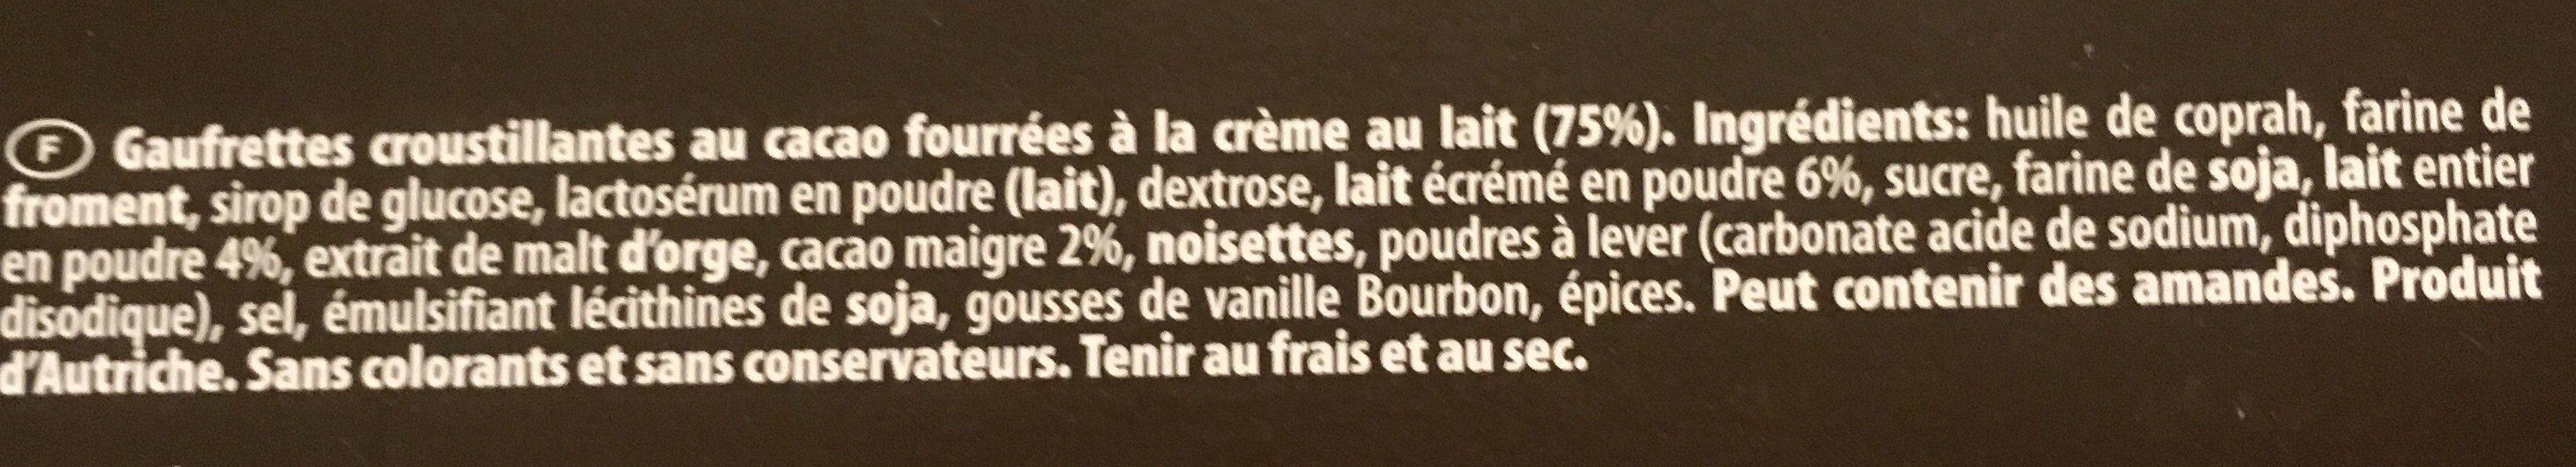 Loacker cocoa milk - Ingrédients - fr